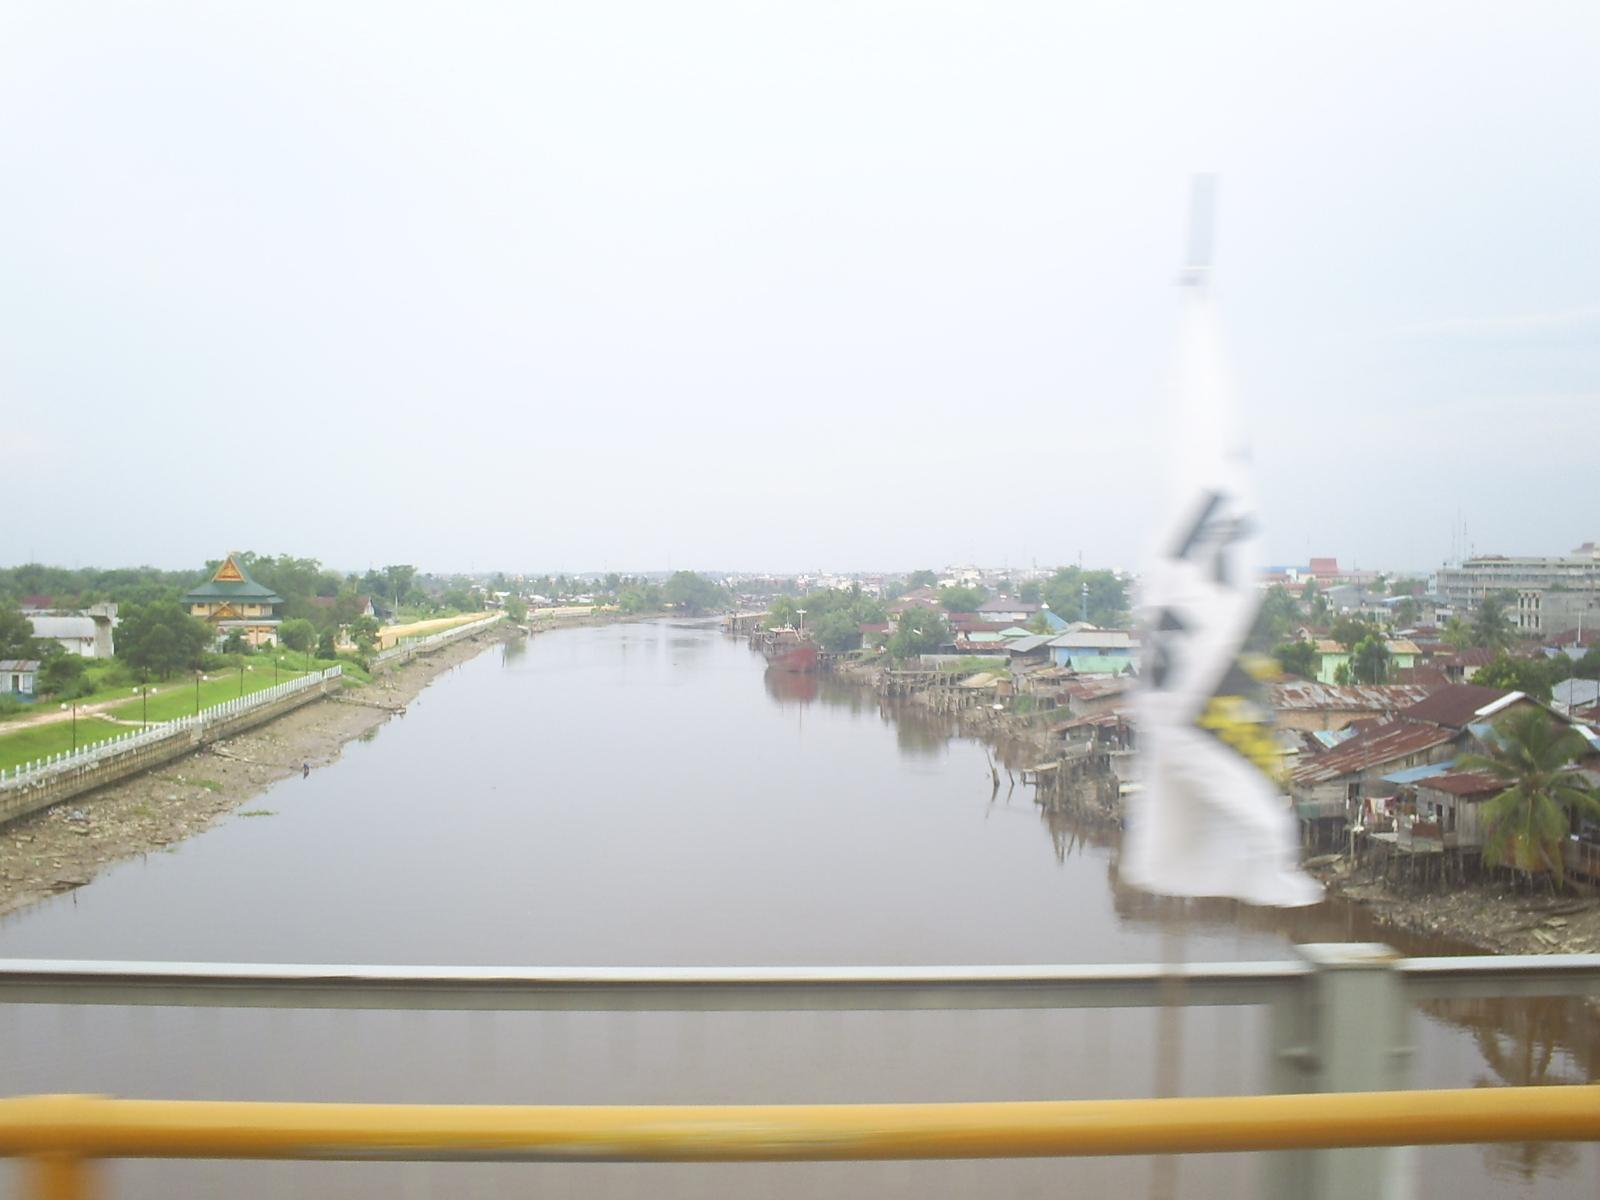 File:Sungai Siak, Pekanbaru.jpg - Wikipedia